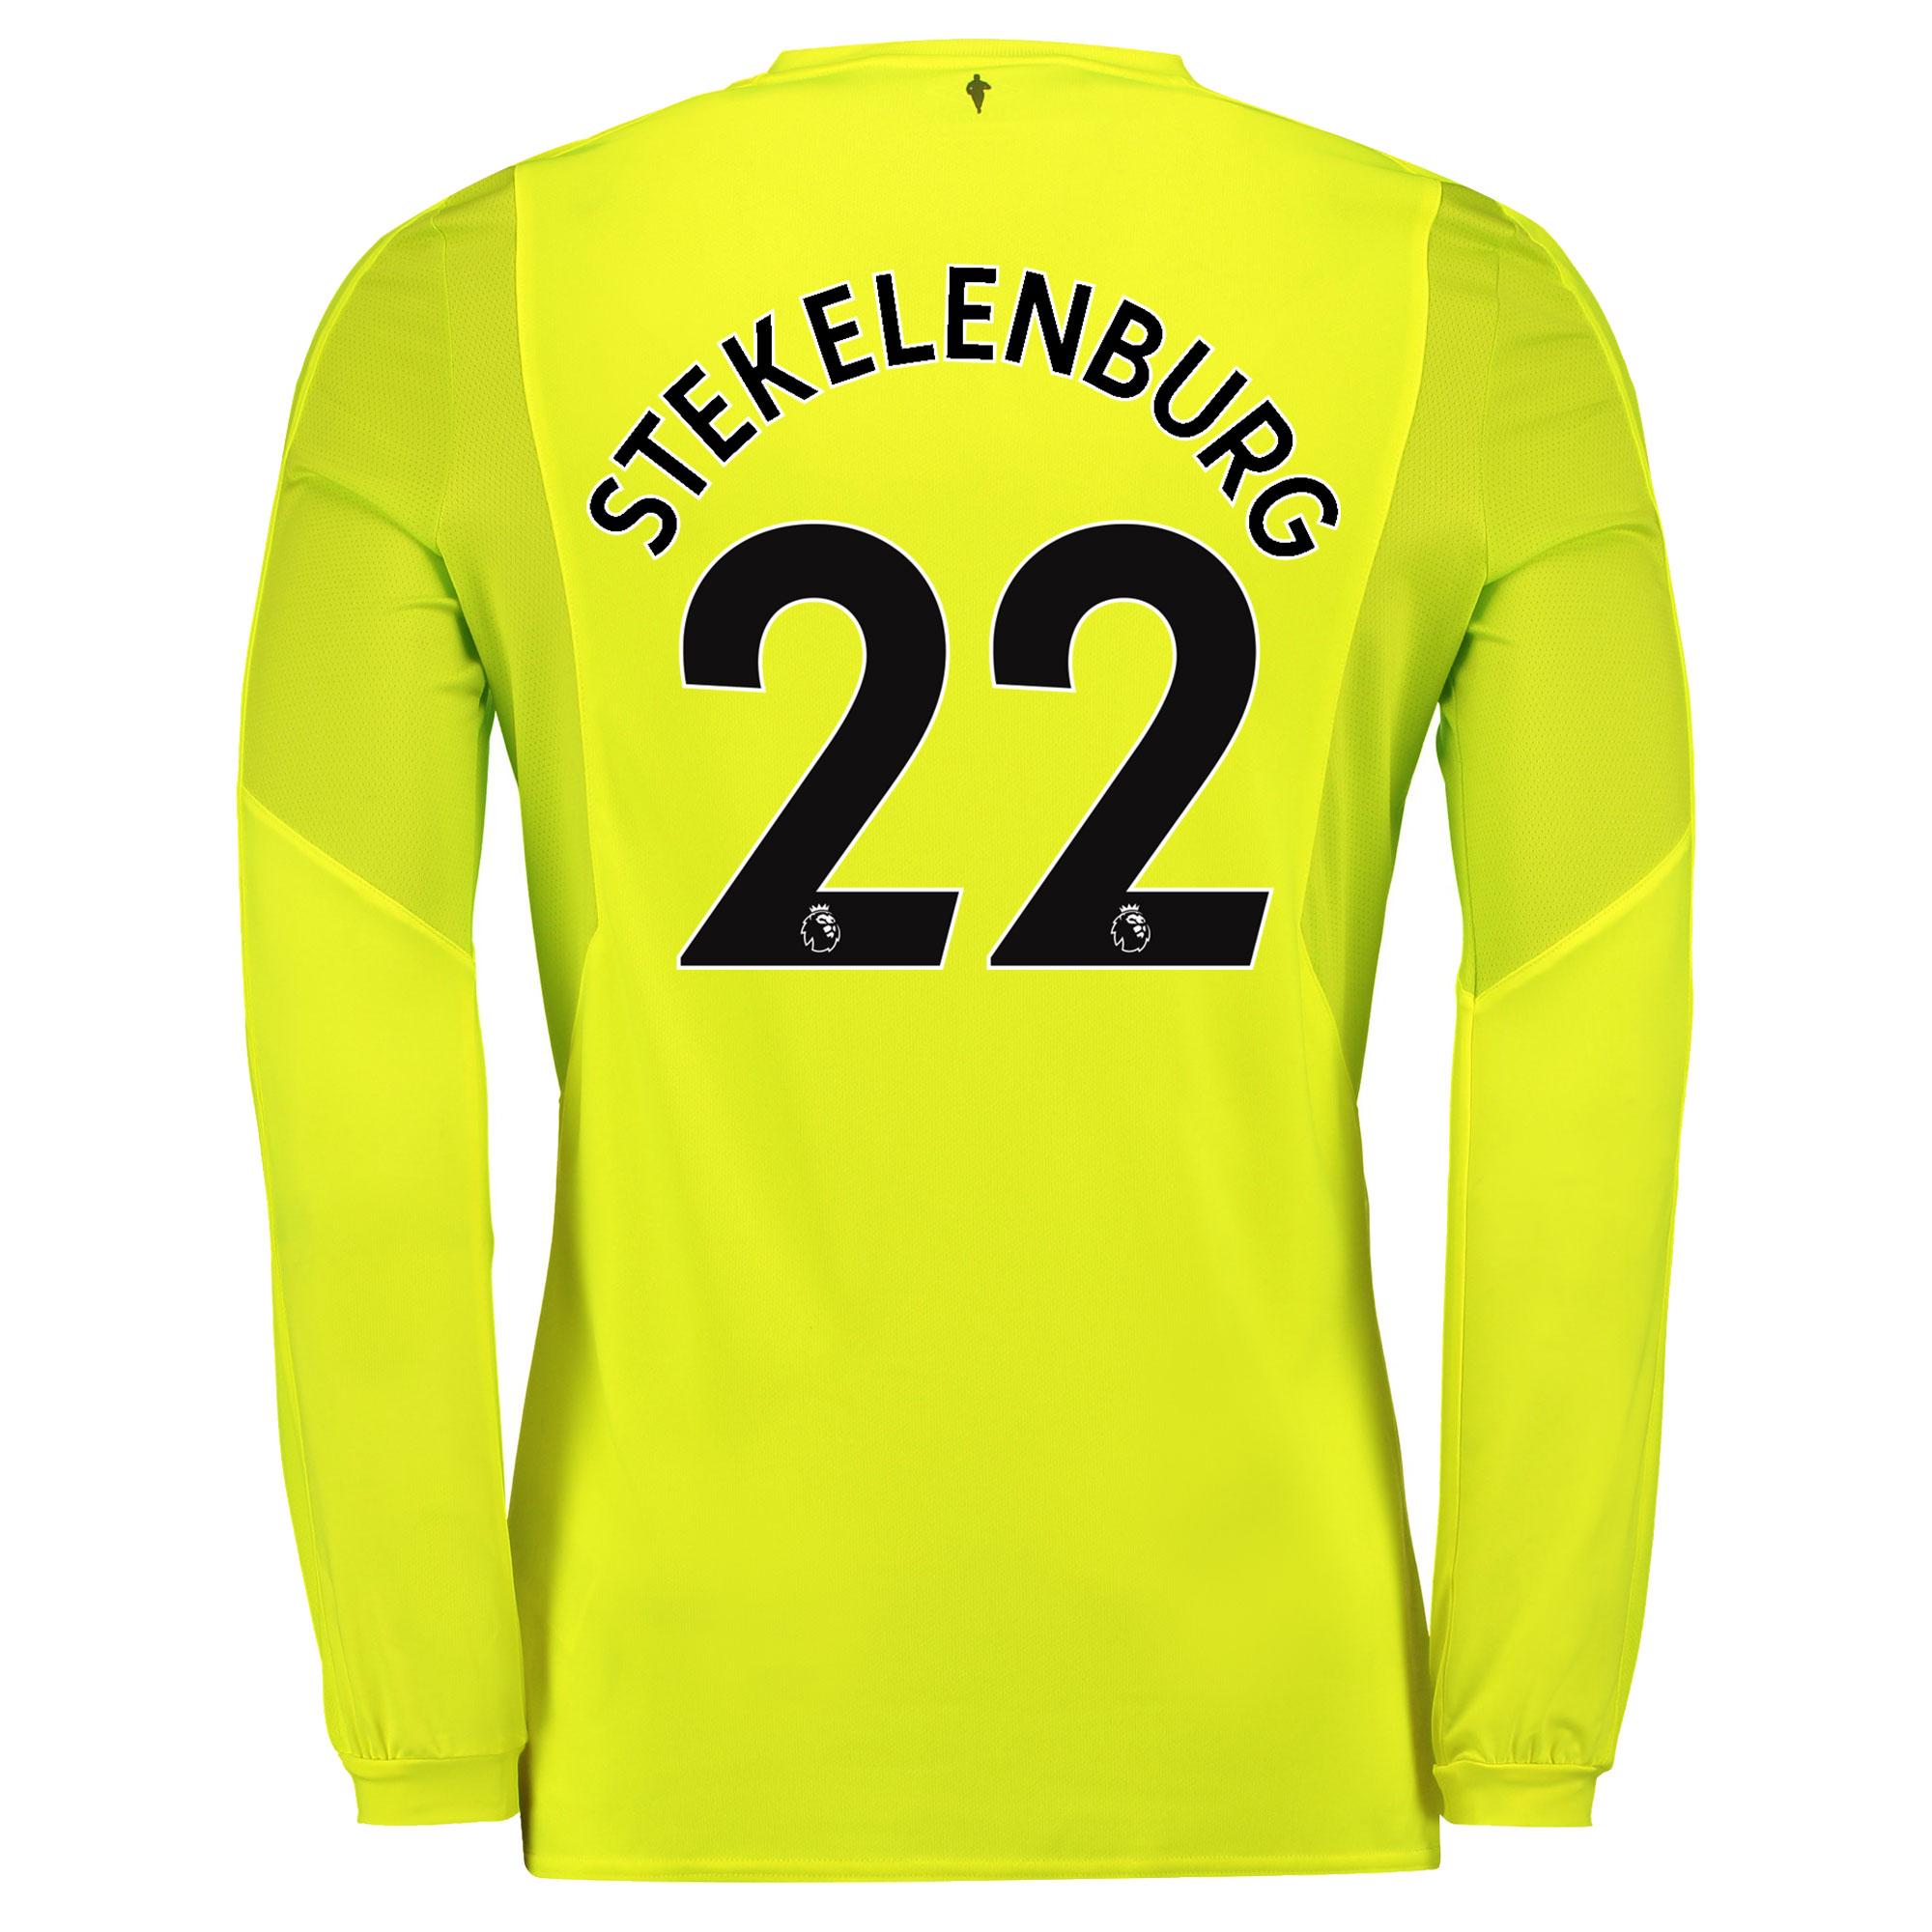 Everton Goalkeeper 3rd Shirt 2017/18 with Stekelenburg 22 printing